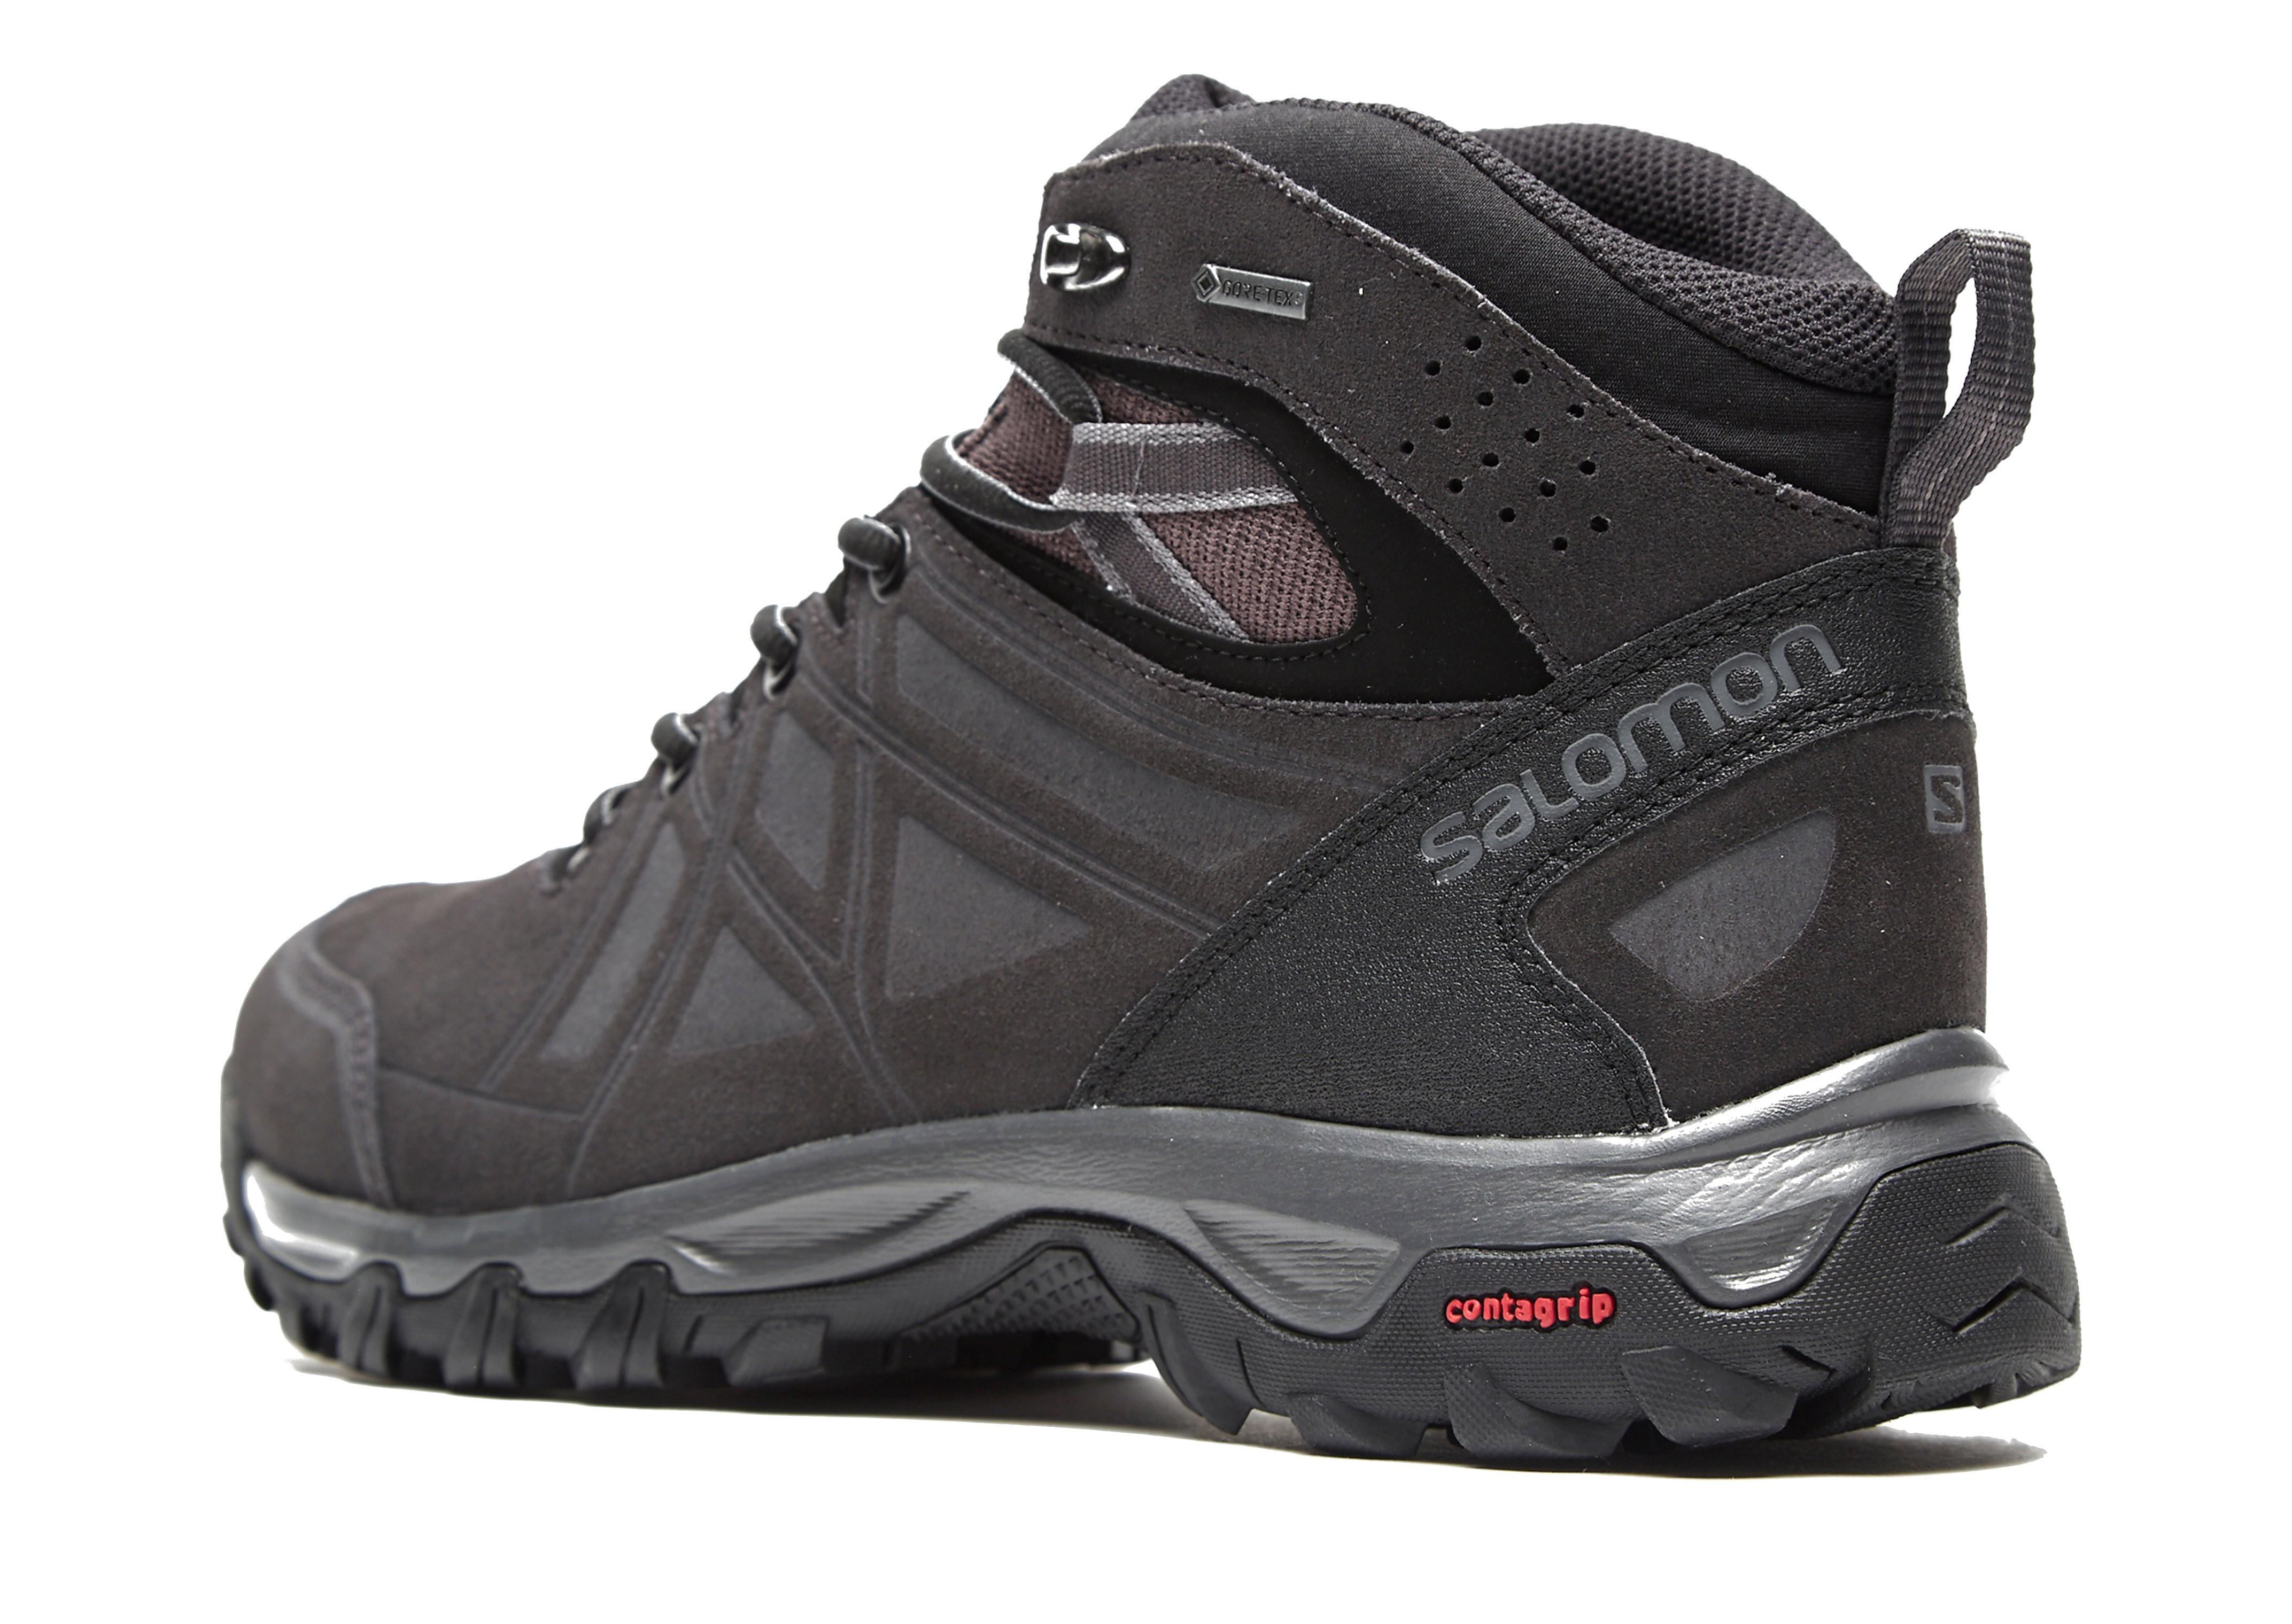 Salomon Evasion 2 Mid GTX Hiking Boots